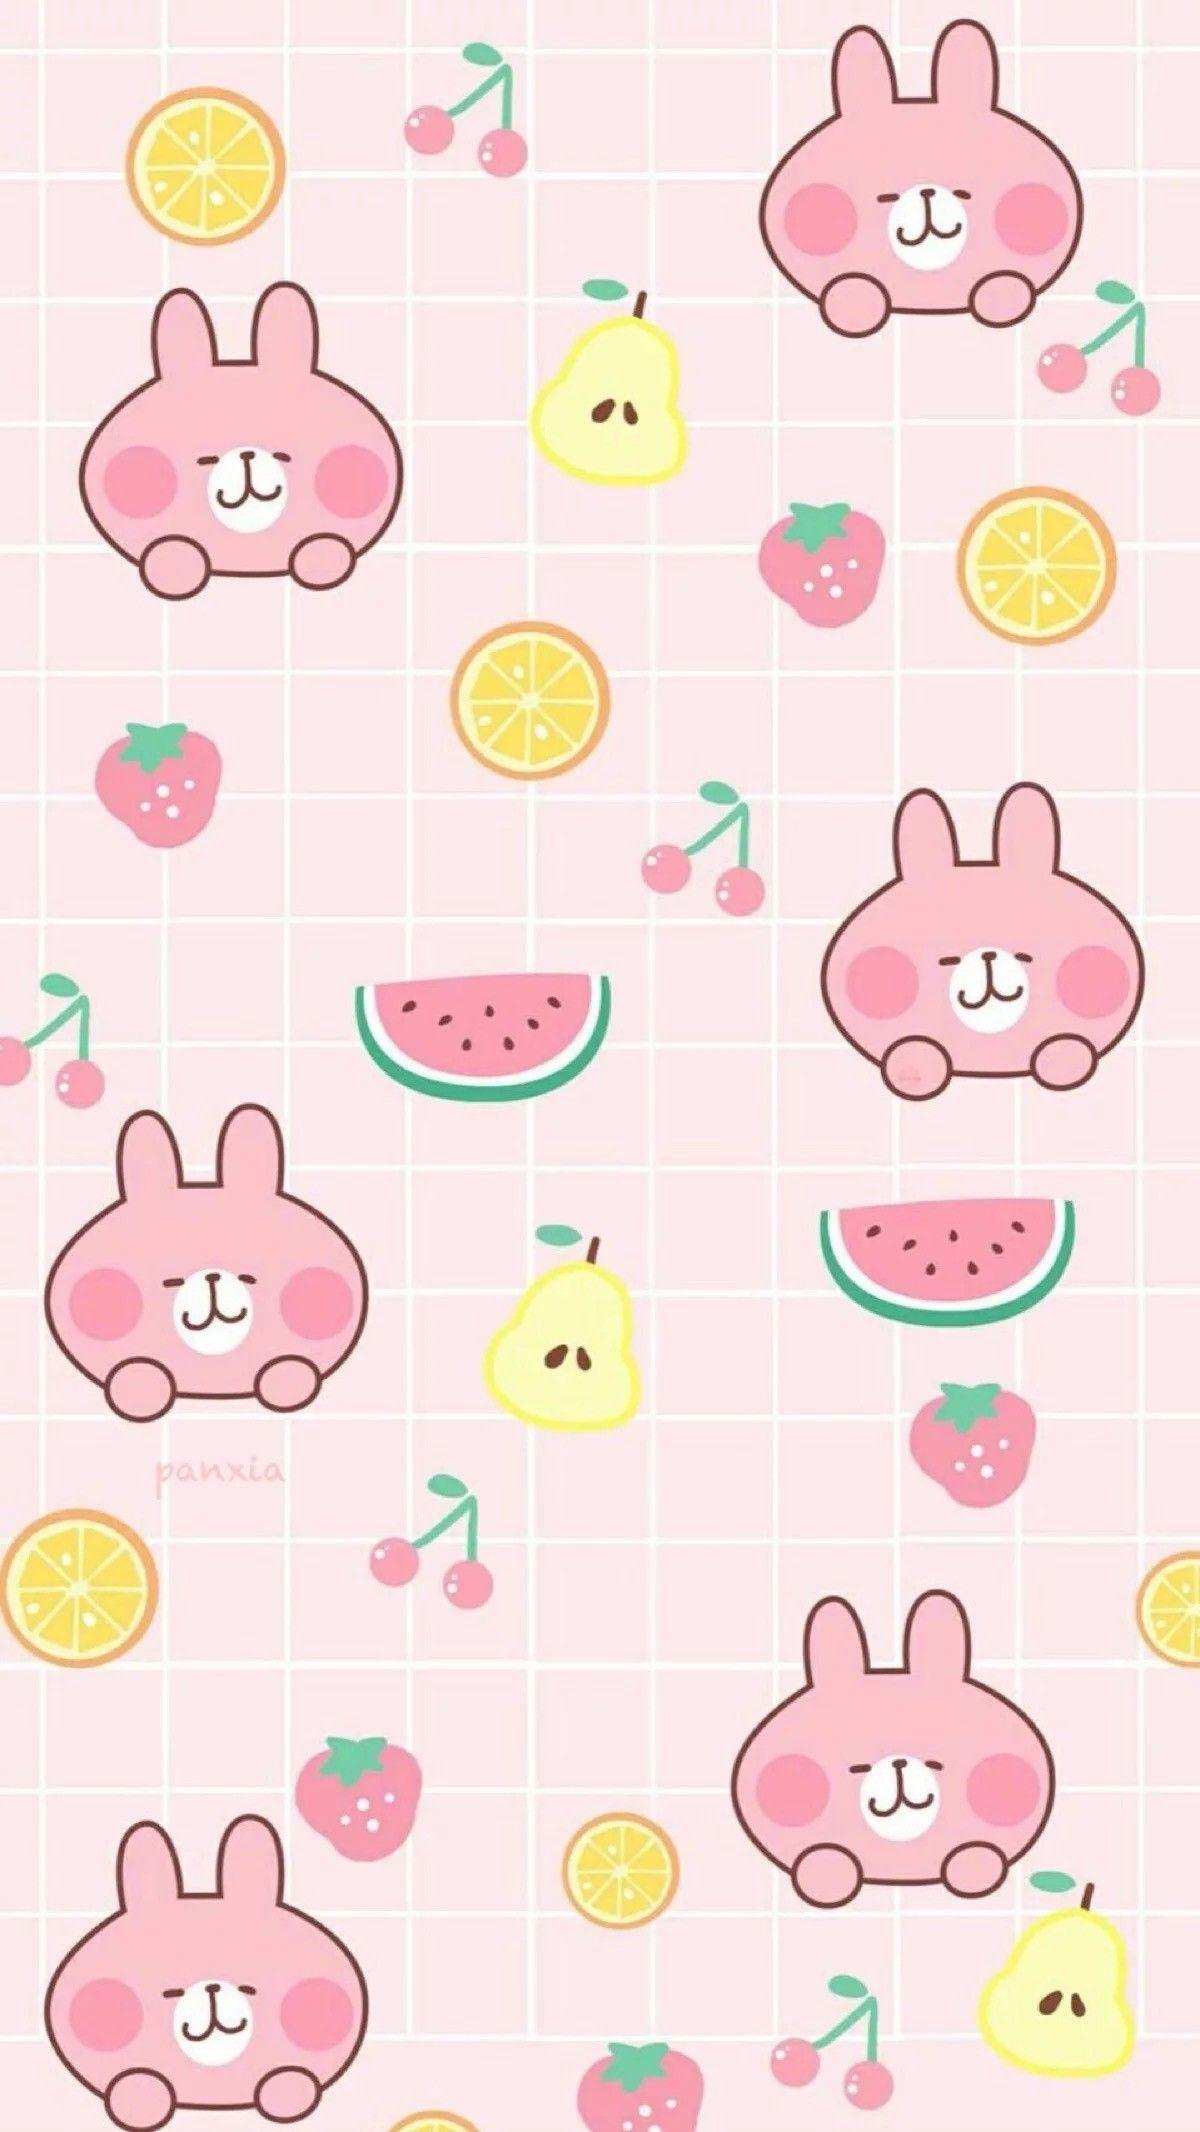 kawaii phone wallpapers - top free kawaii phone backgrounds